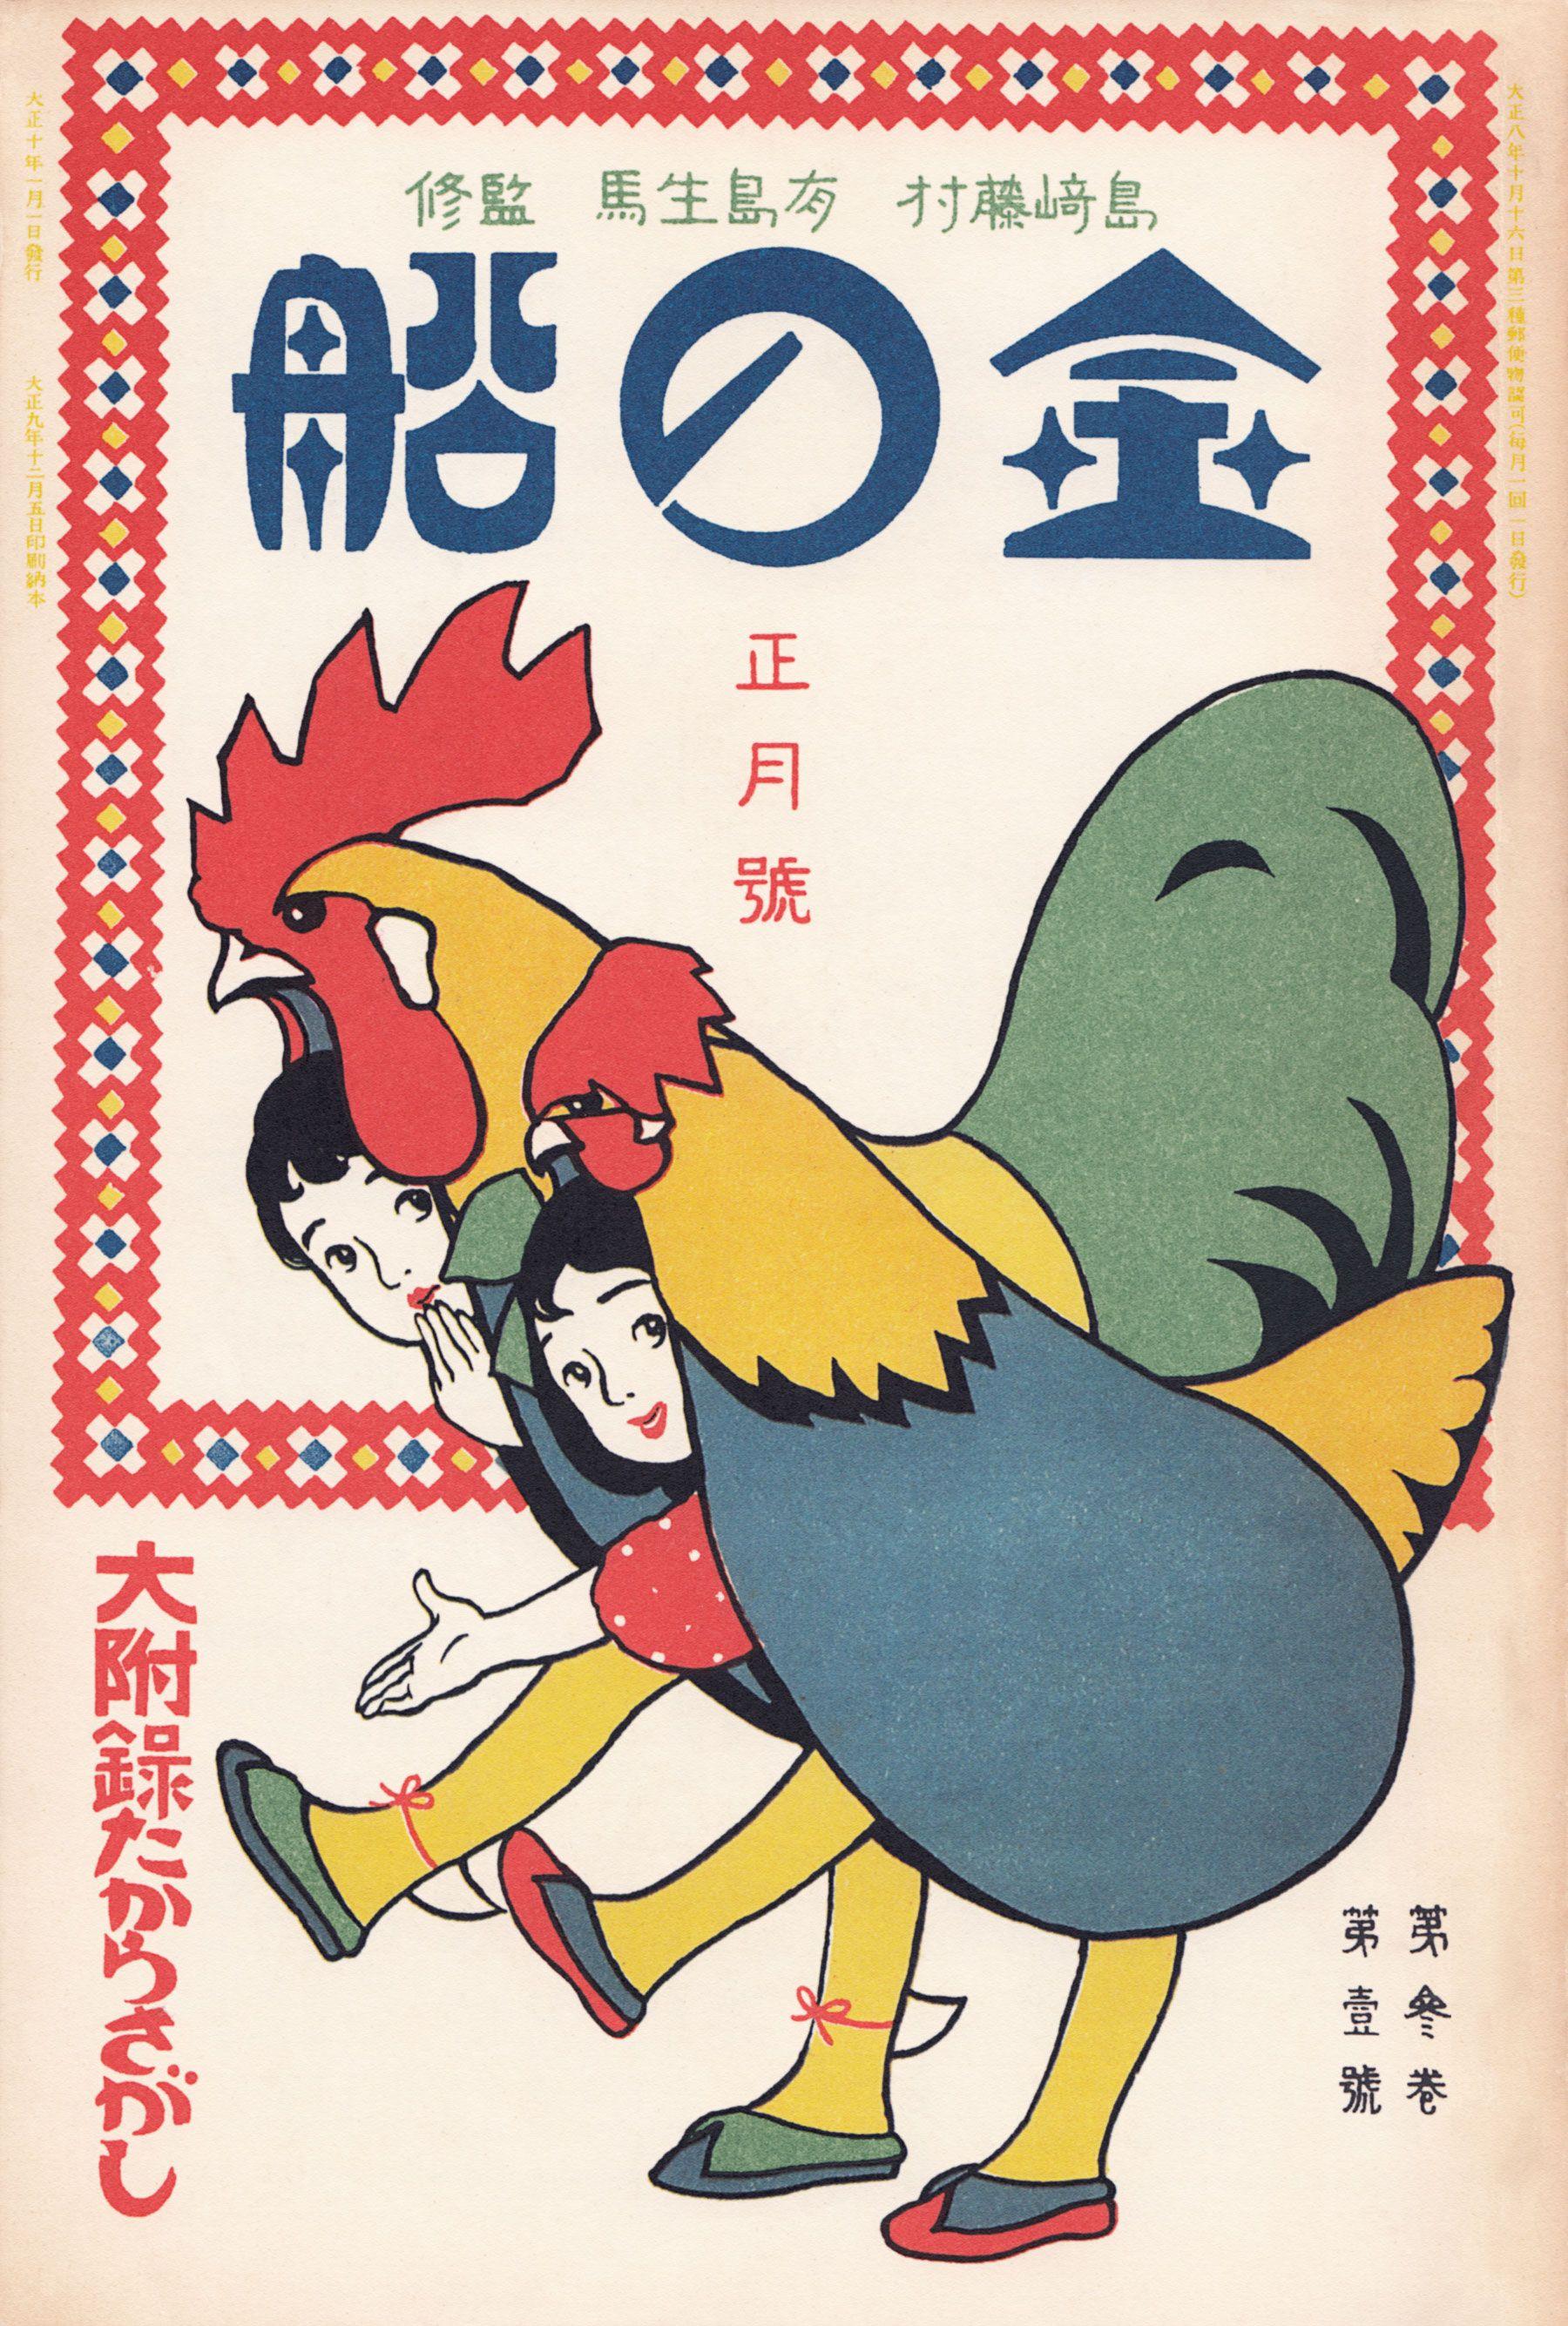 Kin no fune 金の船 (The Golden Boat) magazine. 第3巻 第1号 1月号 1921. Cover art by Okamoto Kiichi 岡本帰一 (1888-1930)